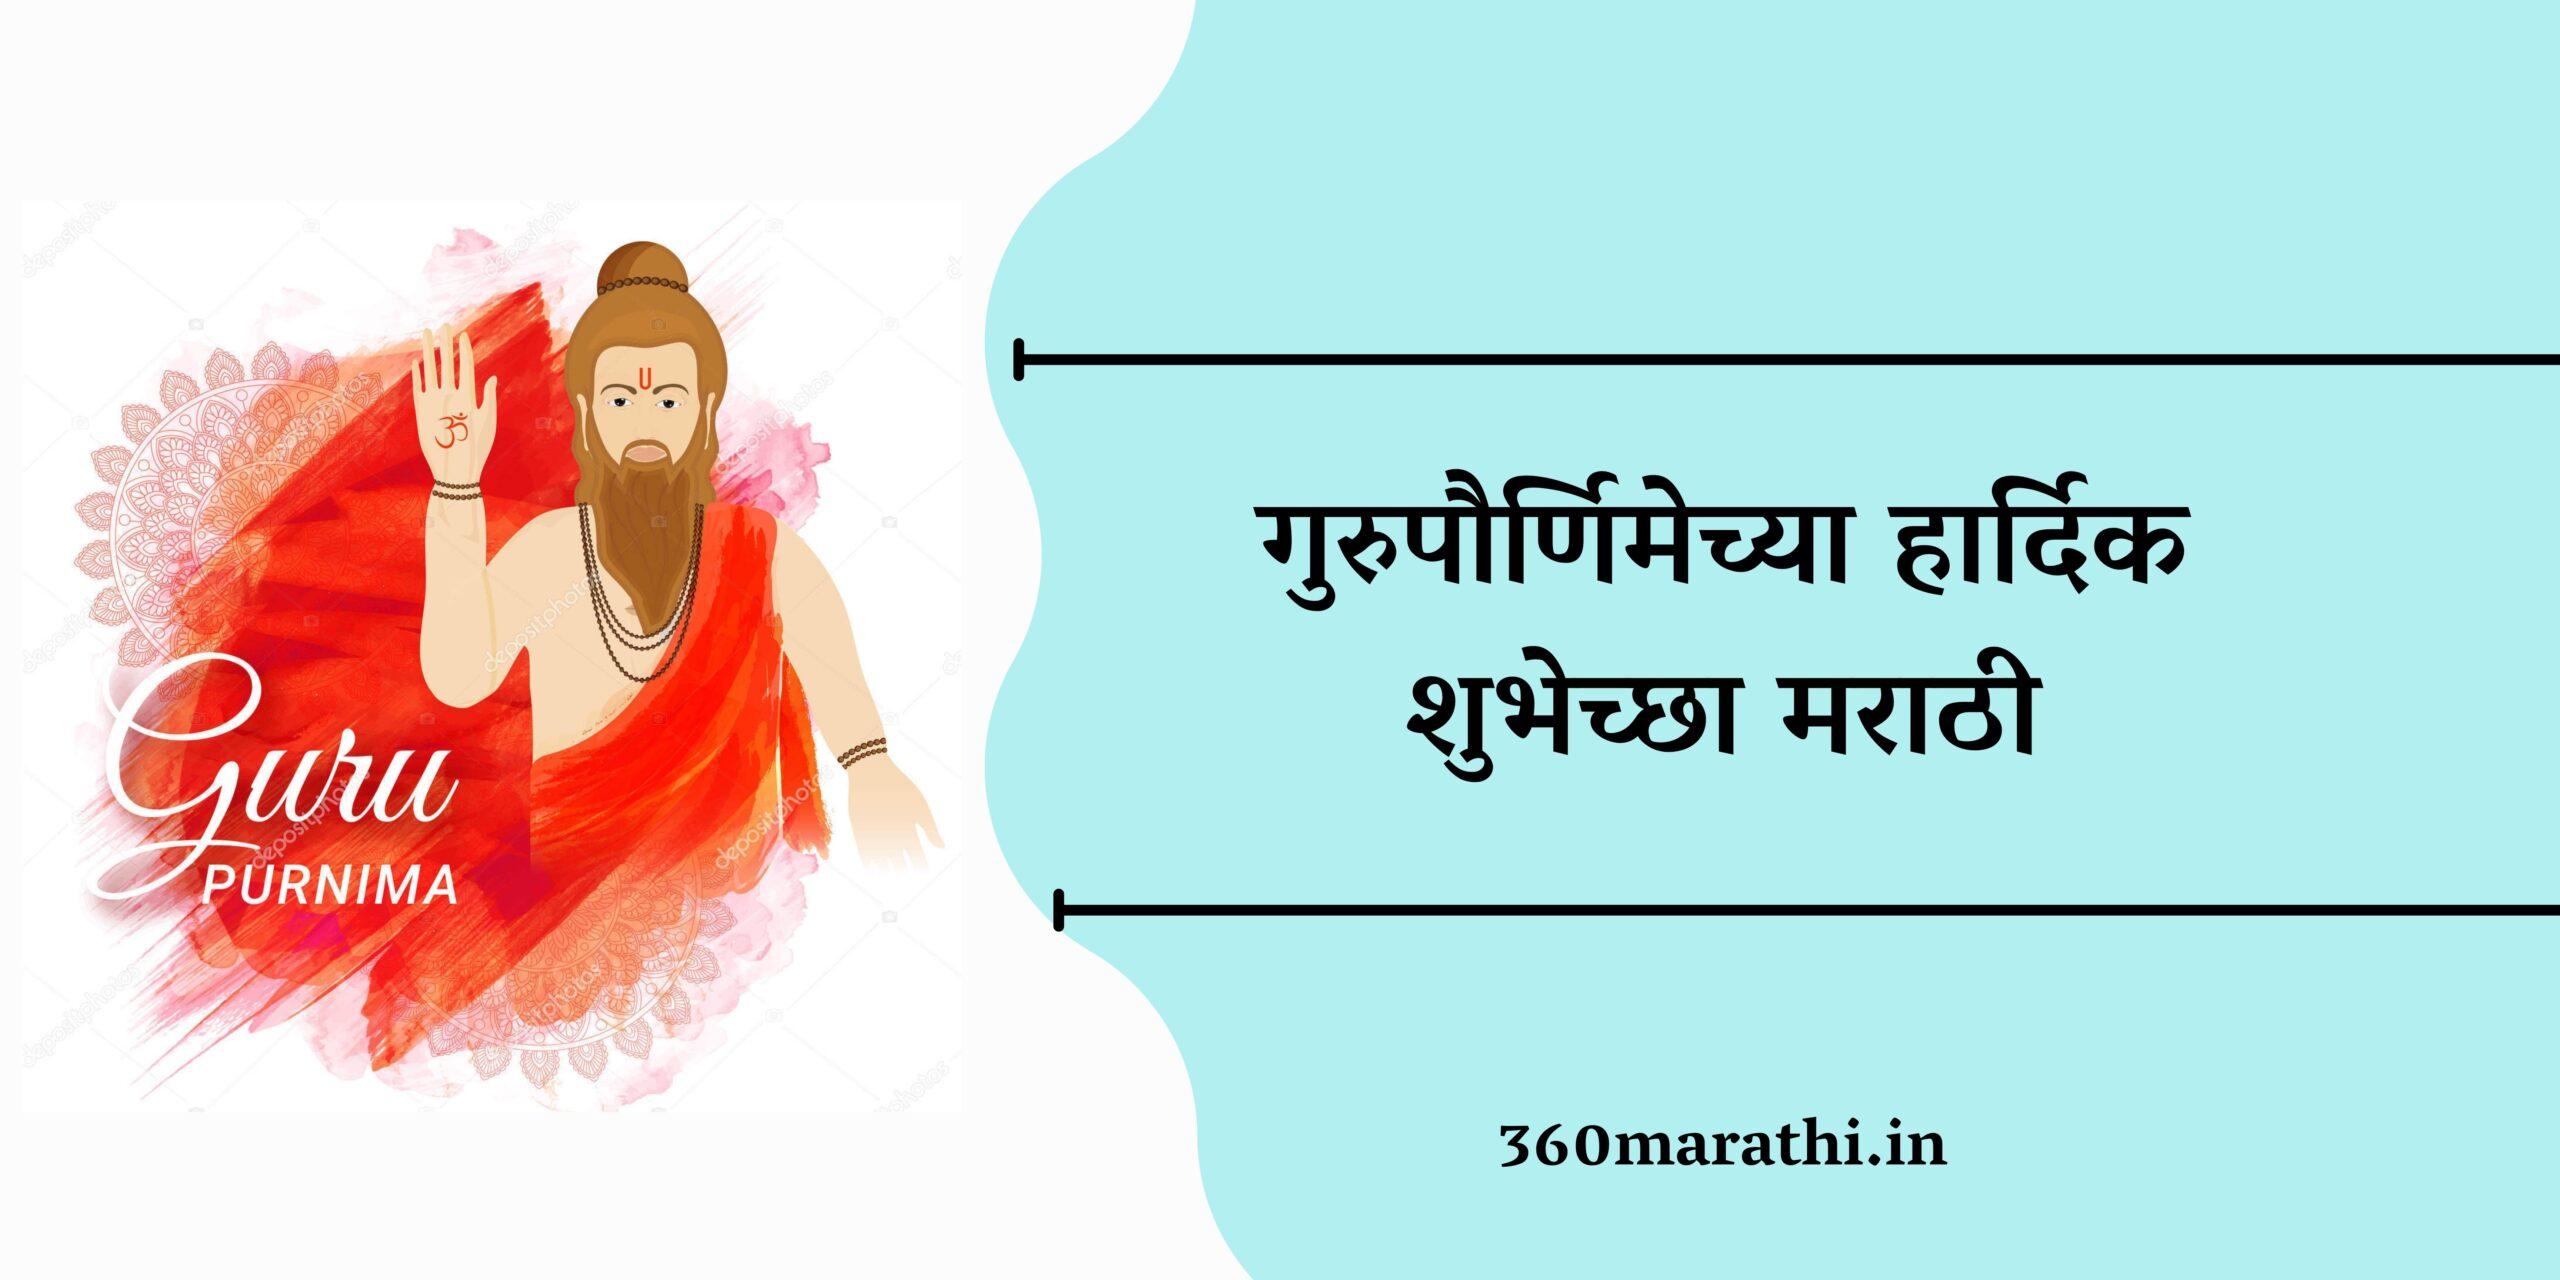 200+ गुरुपौर्णिमेच्या हार्दिक शुभेच्छा | Guru Purnima Quotes in Marathi | Guru Purnima Wishes Images, Messages, Greetings, Whatsapp Status Marathi